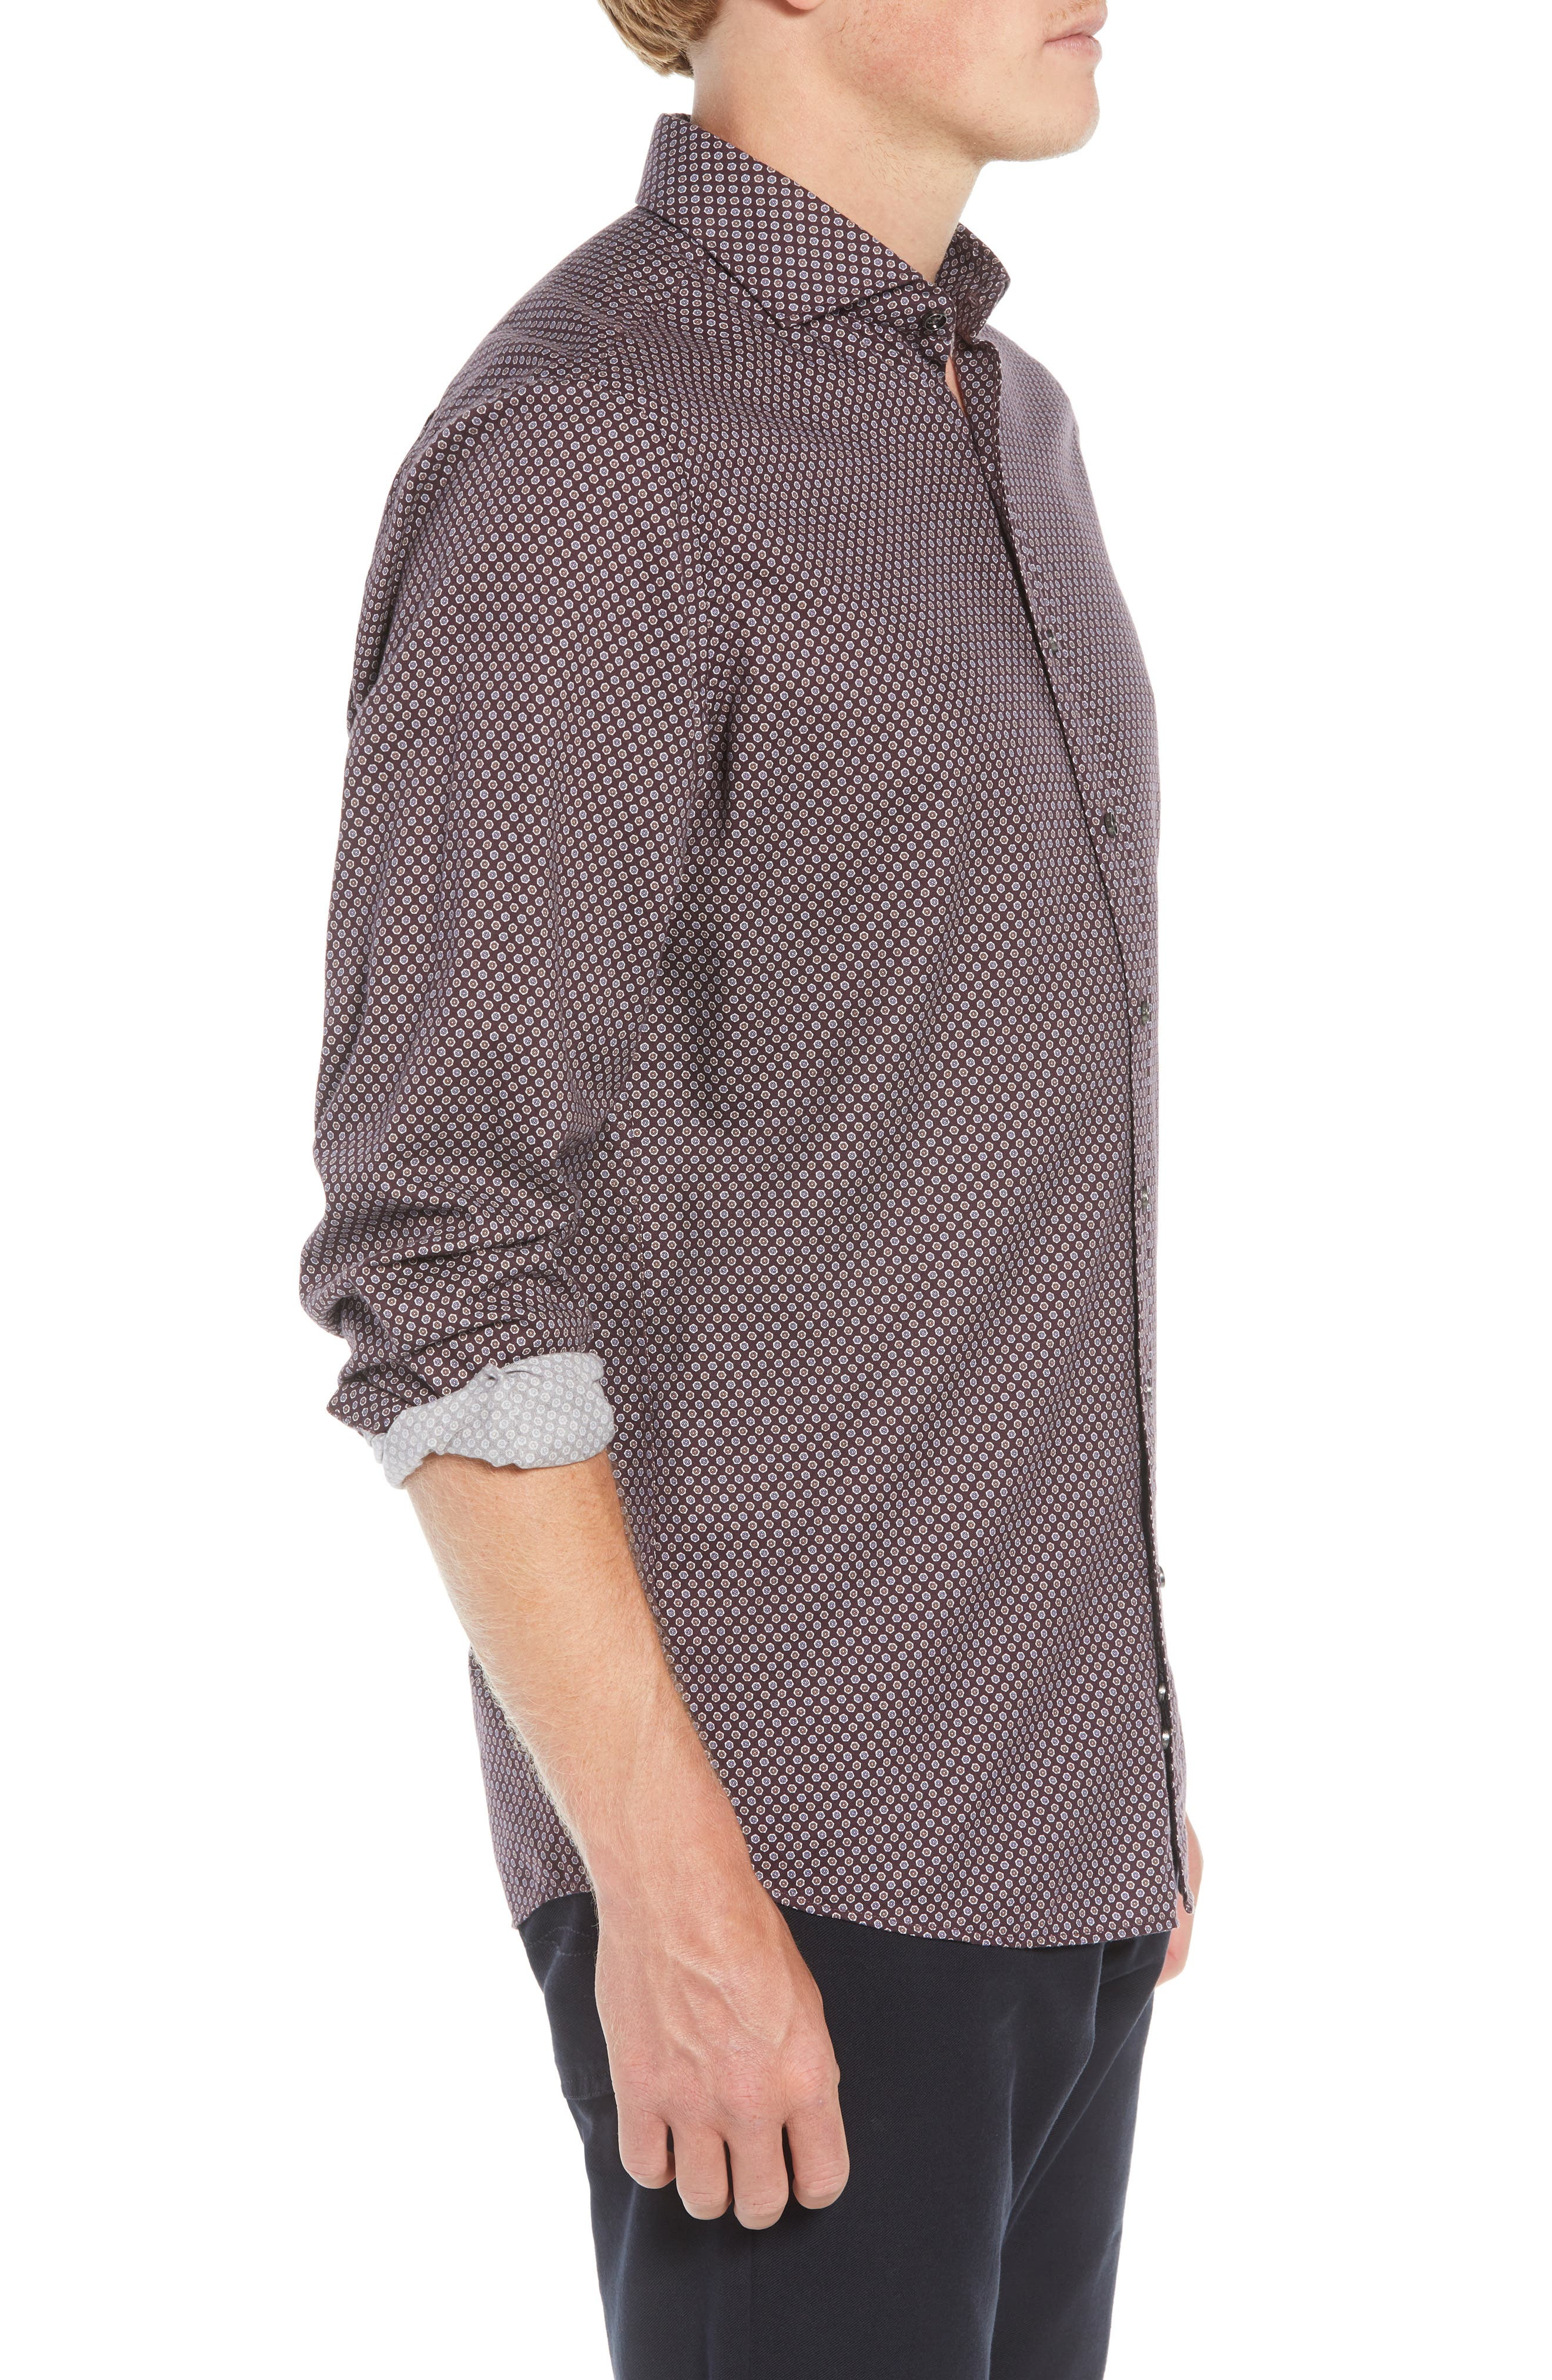 Marsden Bay Regular Fit Sport Shirt,                             Alternate thumbnail 4, color,                             BORDEAUX